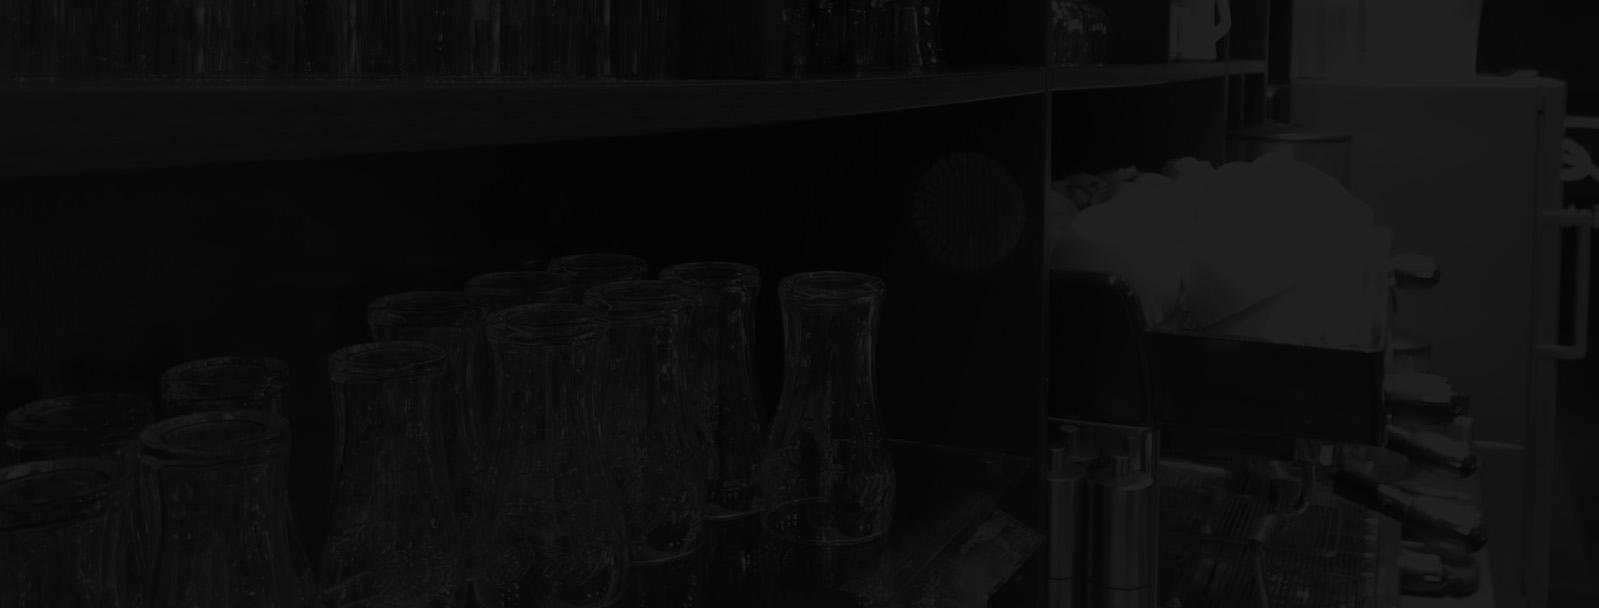 matzen jiddisches restaurant im bochum caf am planetarium. Black Bedroom Furniture Sets. Home Design Ideas